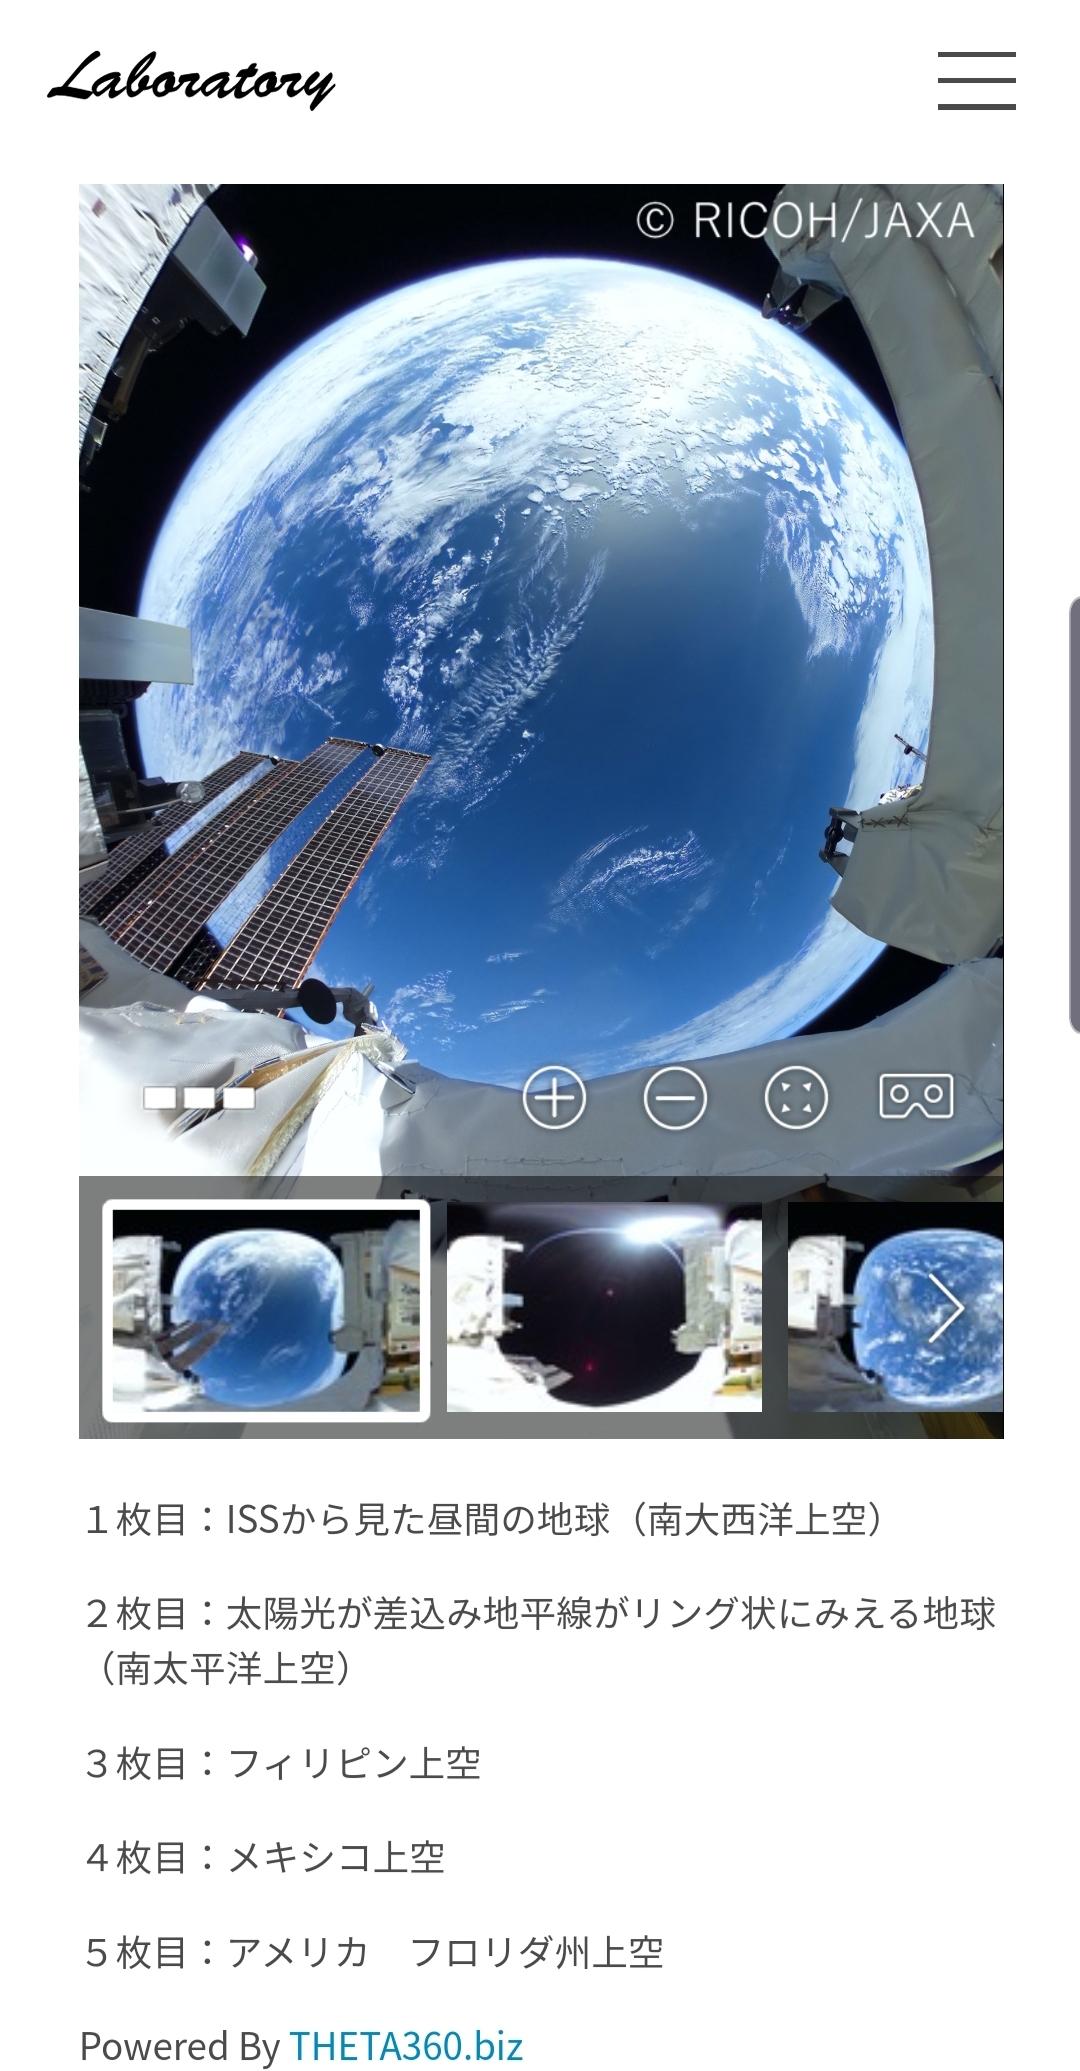 RICOHとJAXAの共同開発によるTHETA S ISS(国際宇宙ステーション)船外の360度画像